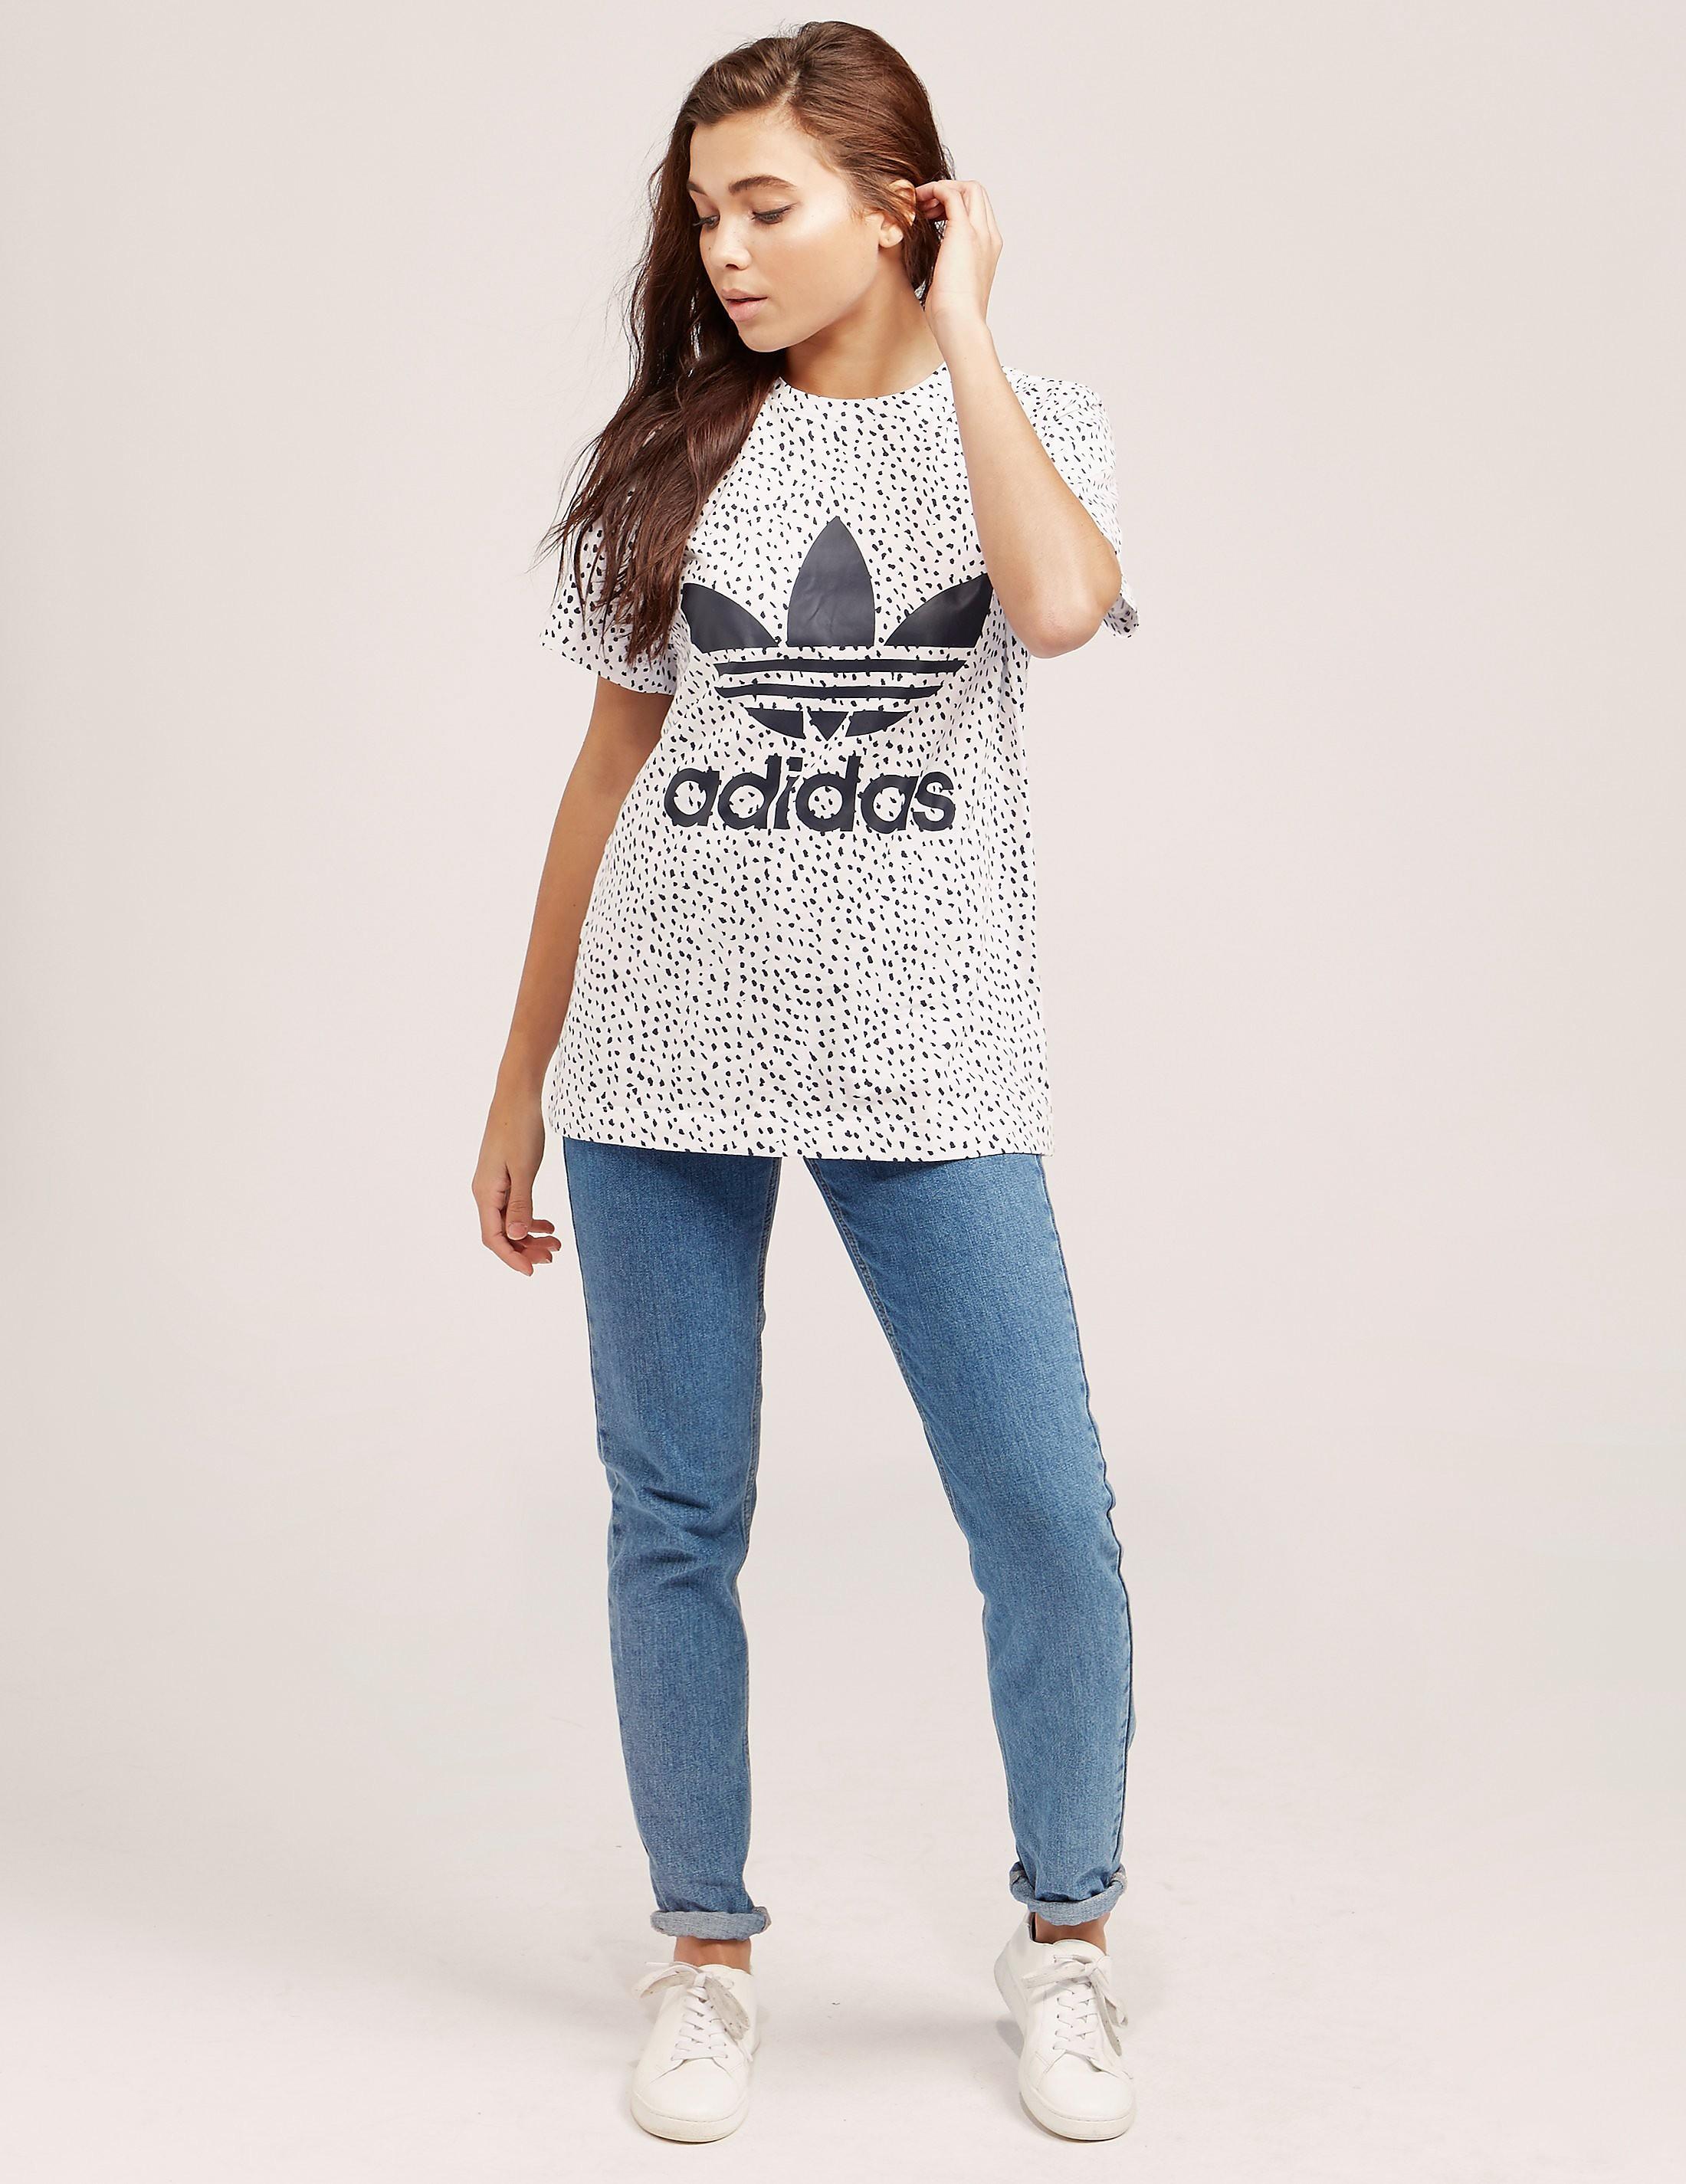 adidas Originals NMD Short Sleeve T-Shirt